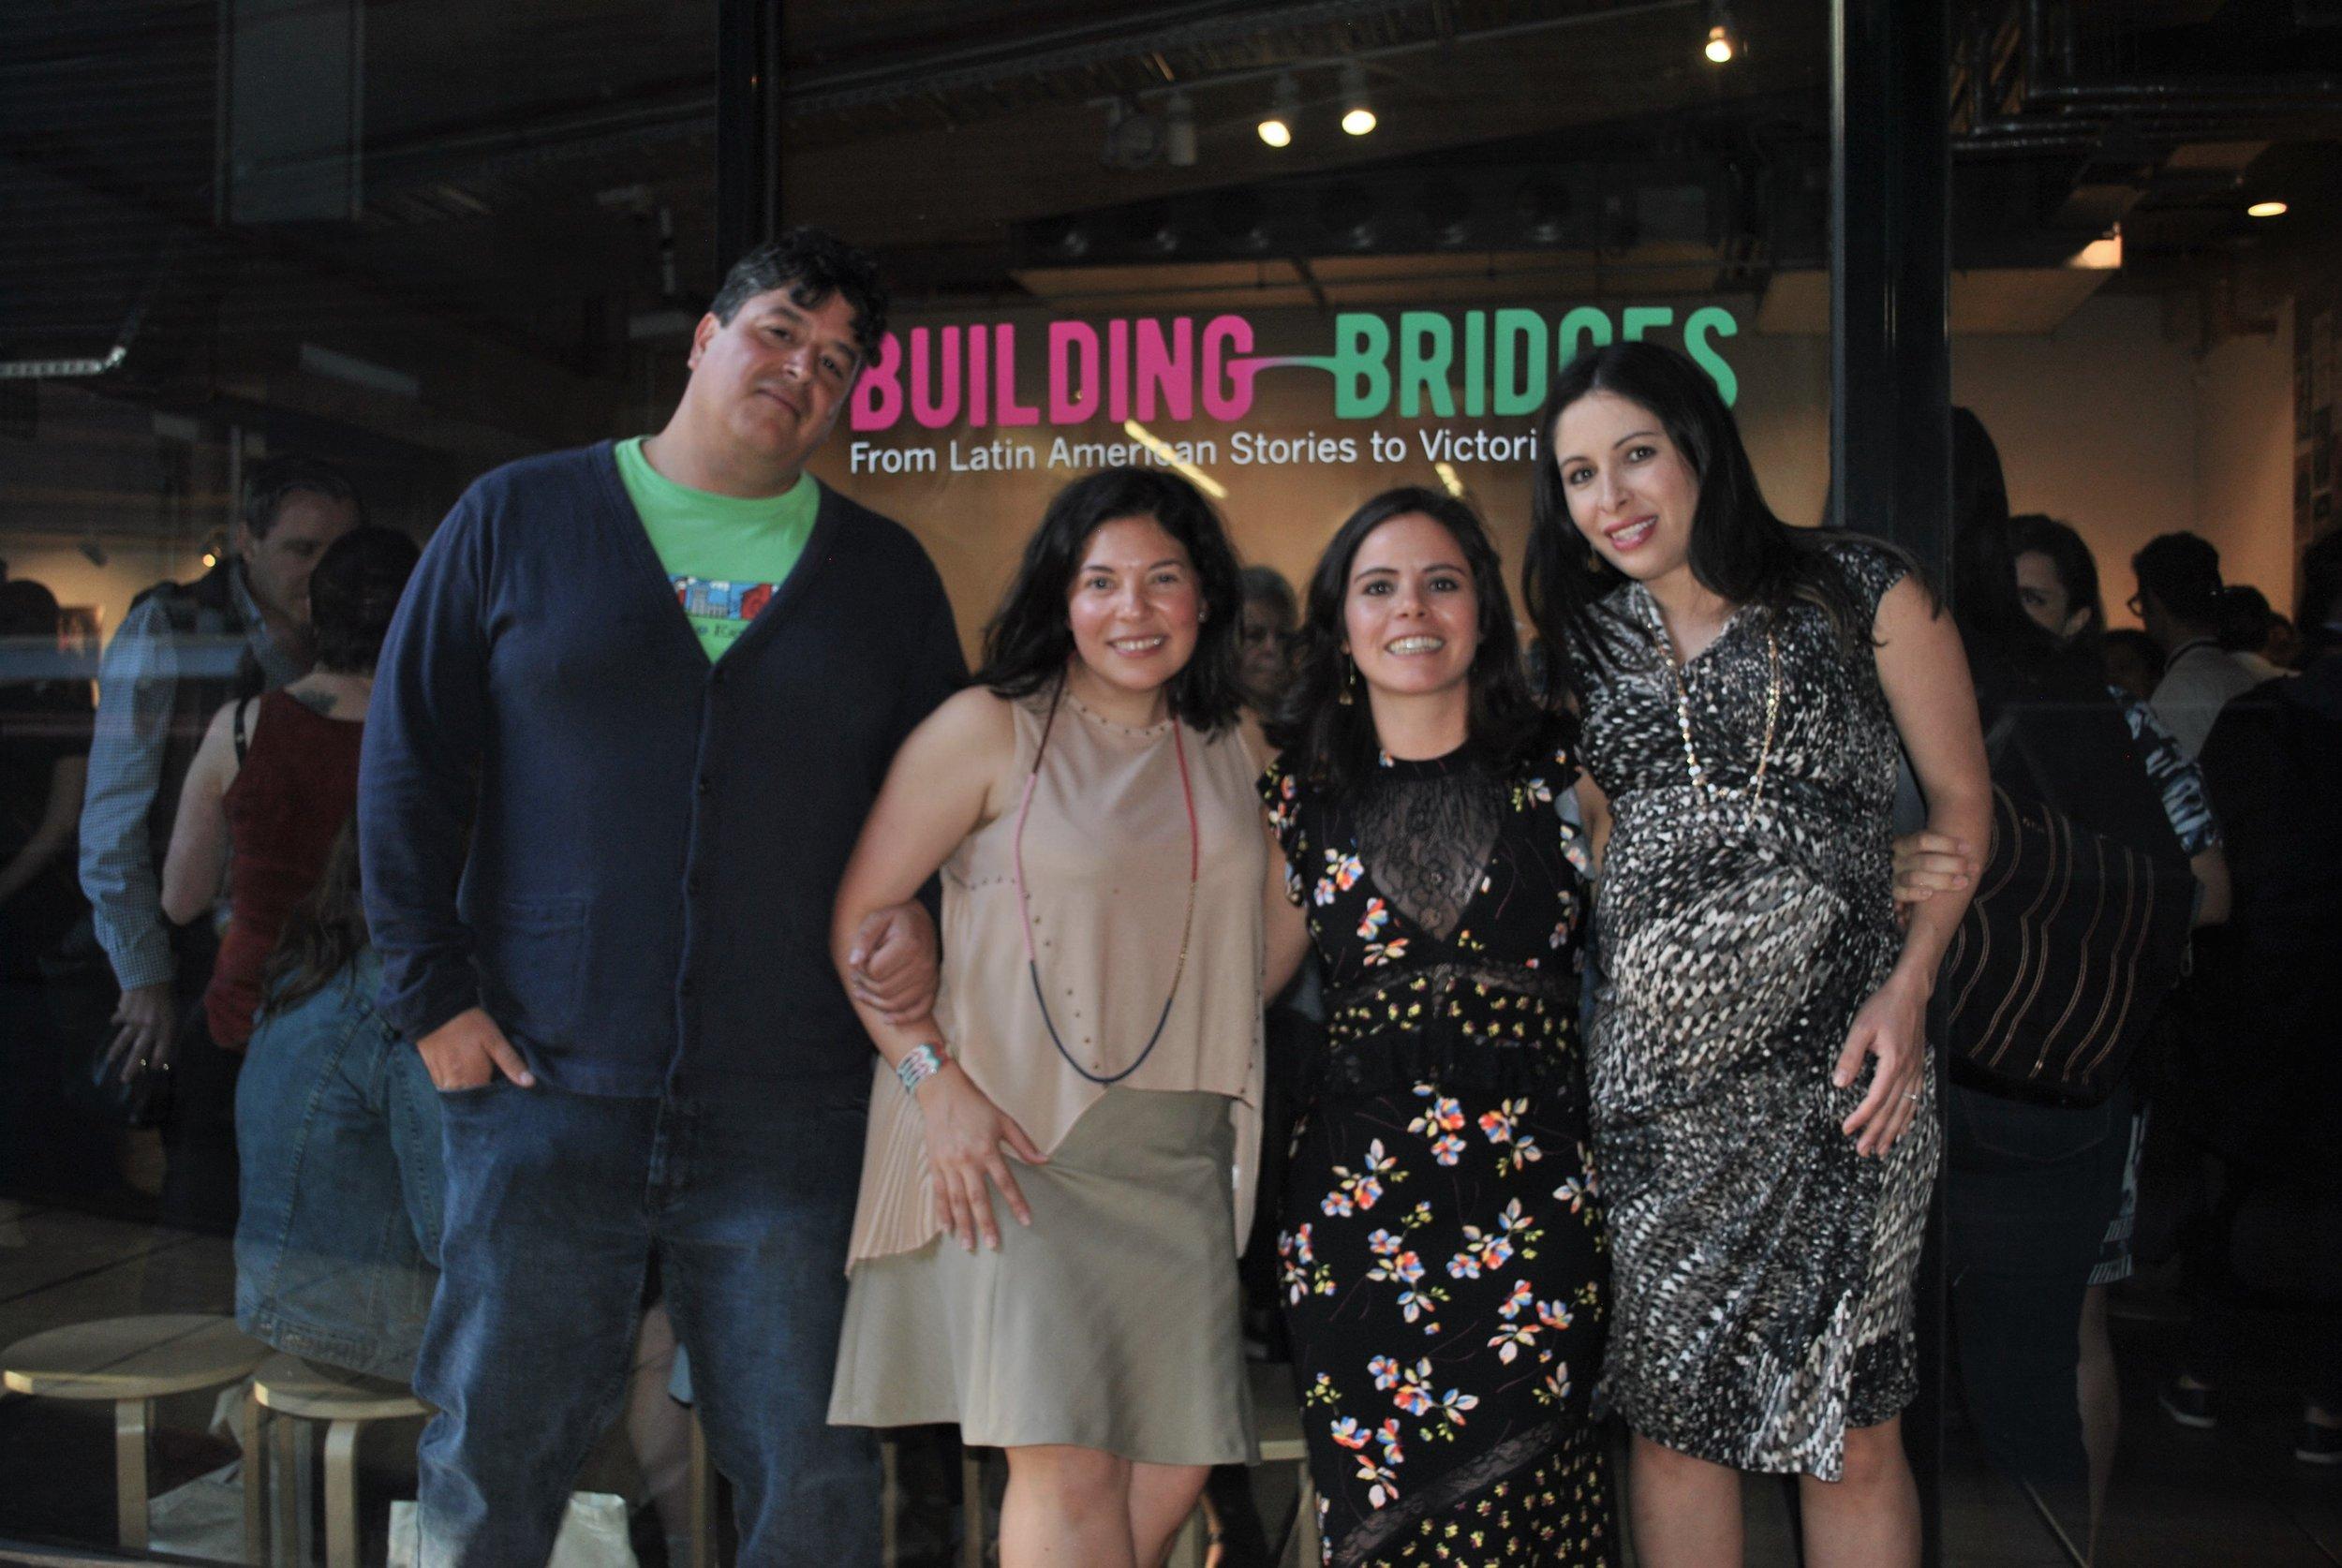 The Building Bridges team: ( from right ) Cristina Abela, Trini Abascal (Directors and Founders, Latin Stories Australia), Yunuen Perez and Antonio Gonzalez (curators).